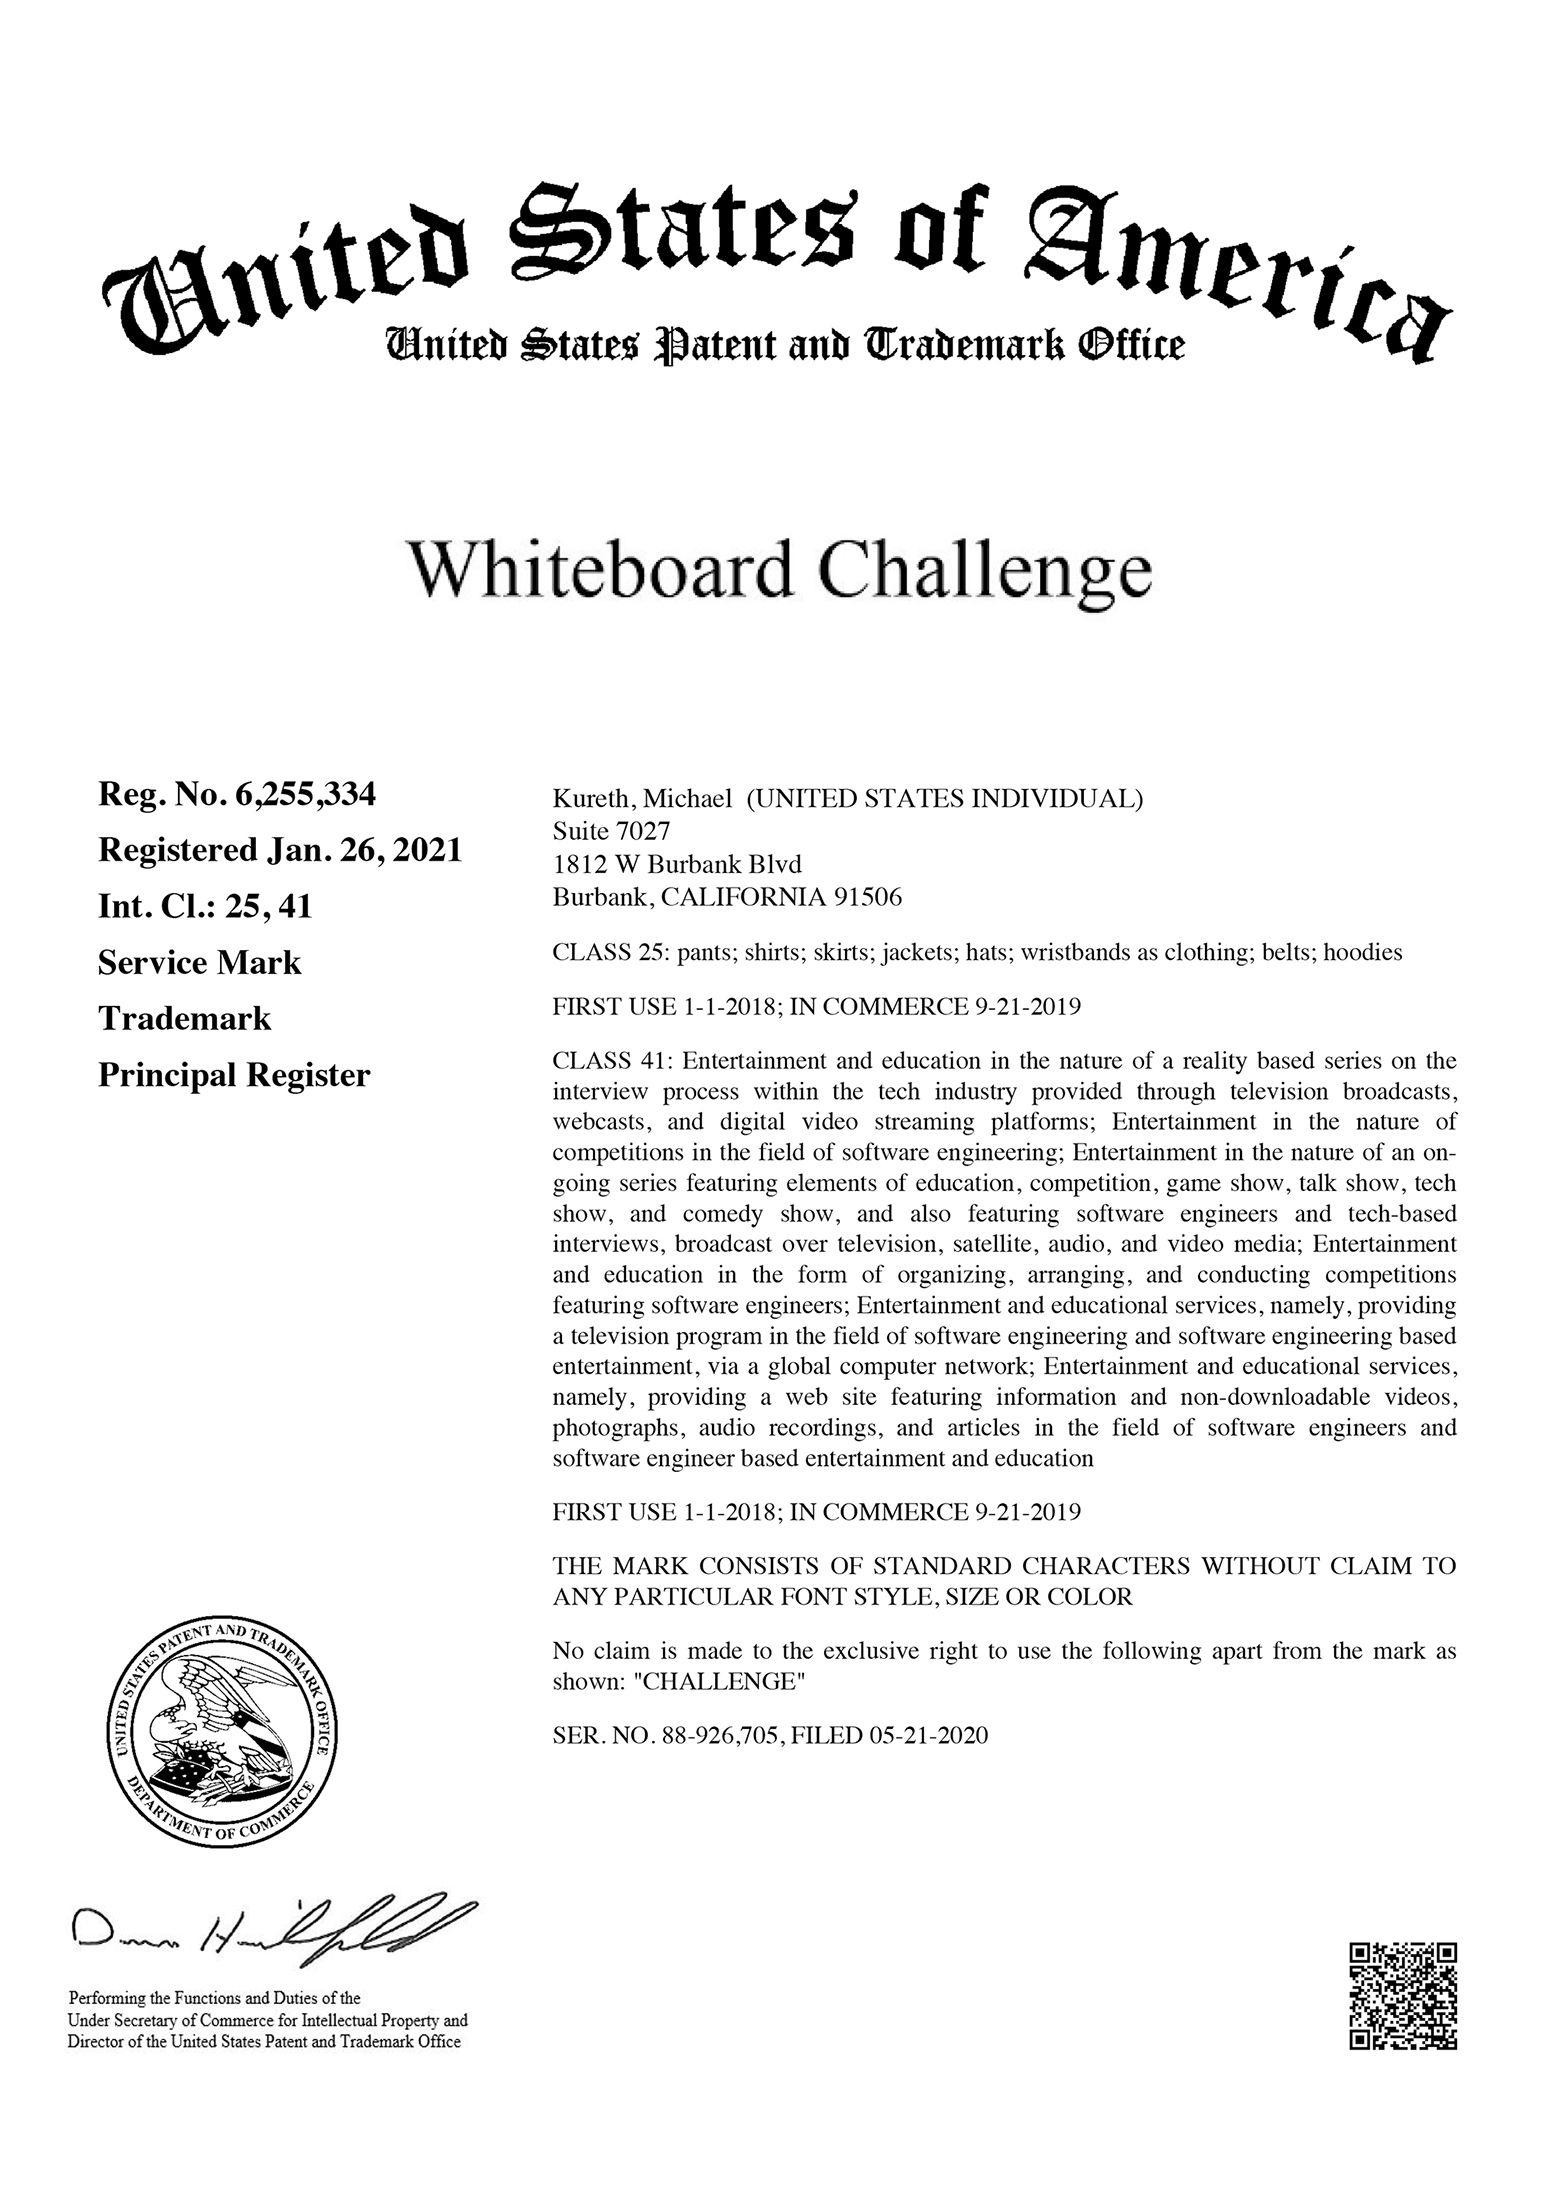 Whiteboard Challenge - Michael Kureth - Trademark